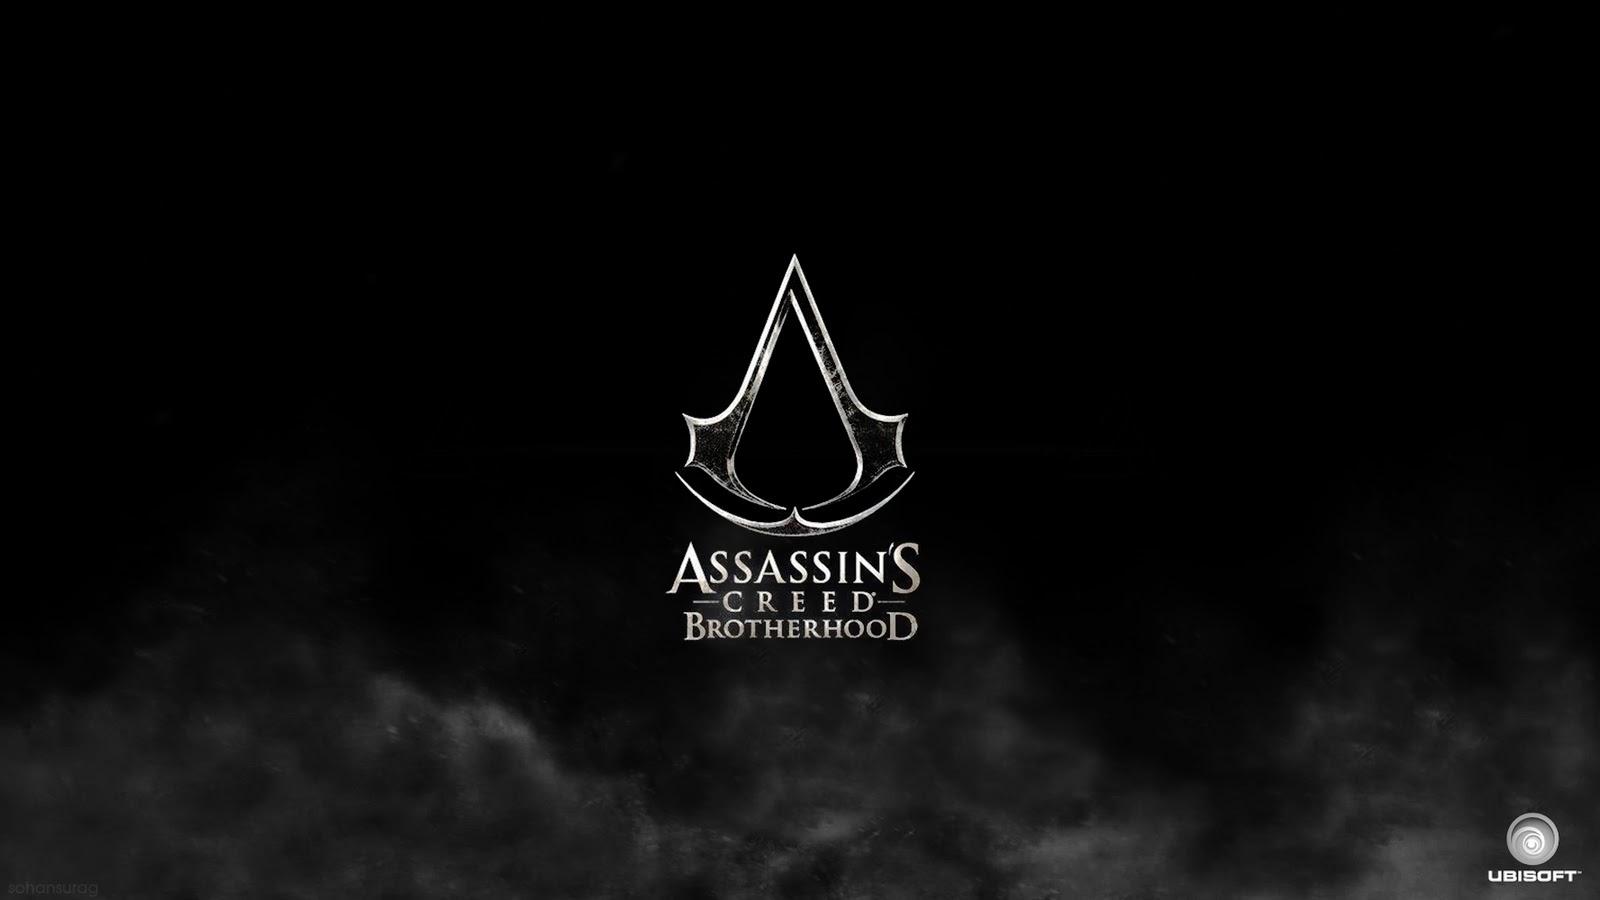 Assassins Creed Logo HD Wallpaper 1600x900